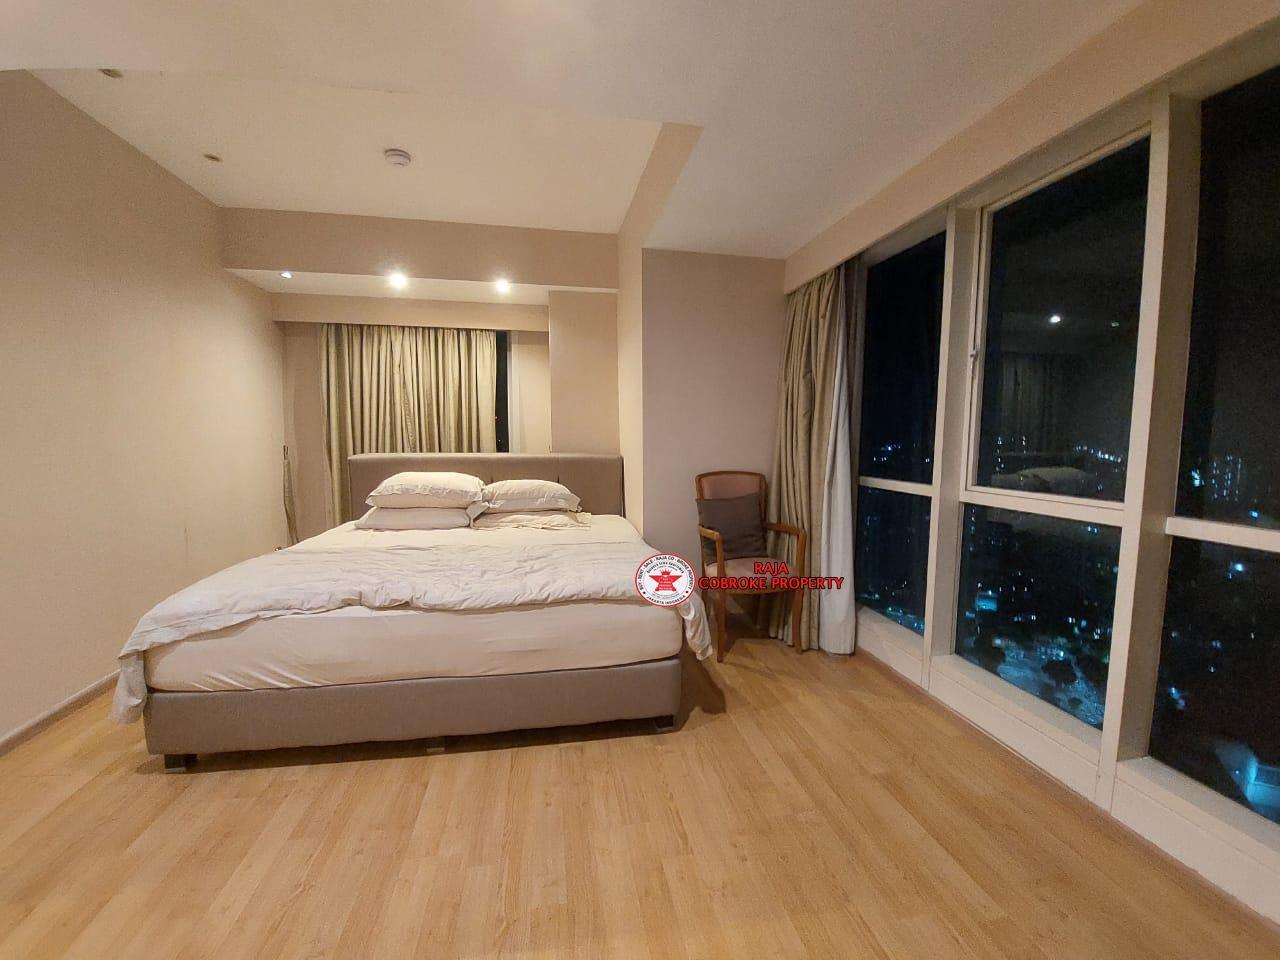 2BR modif 117 Dari 3BR Apartemen CasaGrande Residence  apartemen mega kuningan,apartemen casablanca casagrande residence,apartemen kuningan city denpasar residence D7AD0ABB F099 42B1 BAD5 C4CBDB737ADE